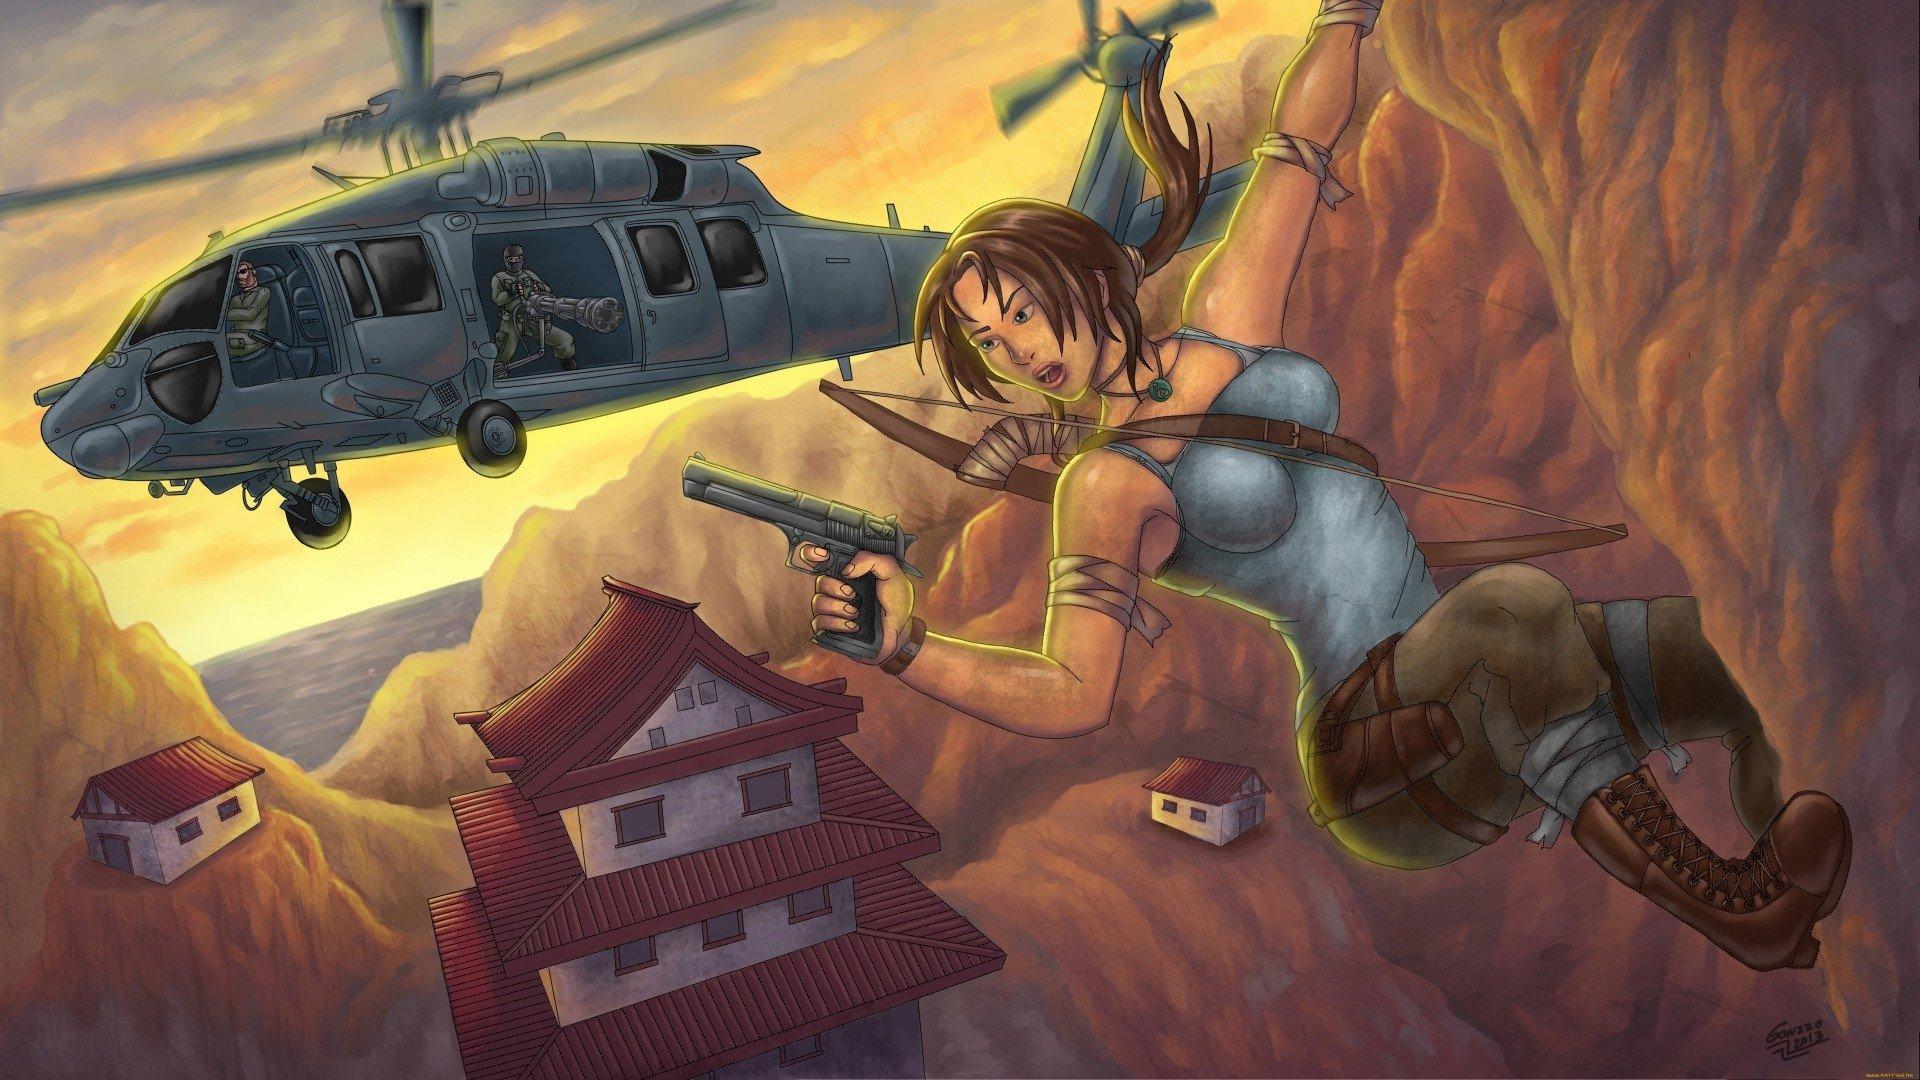 thumb-1920-466257.jpg - Tomb Raider (2013)